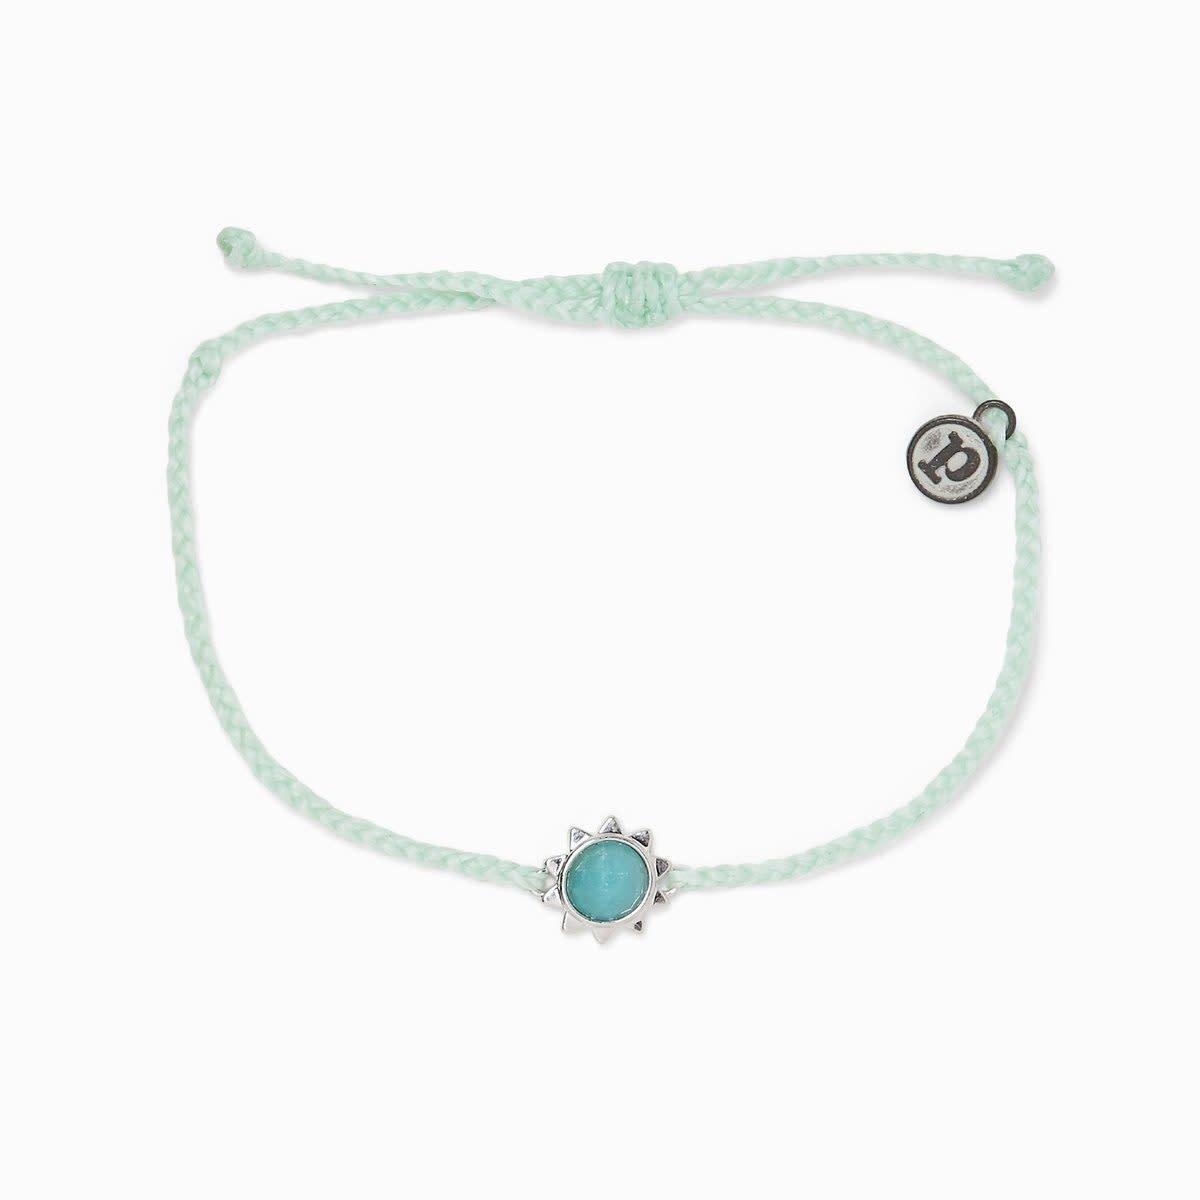 PuraVida Puravida Sunkissed Silver Bracelet